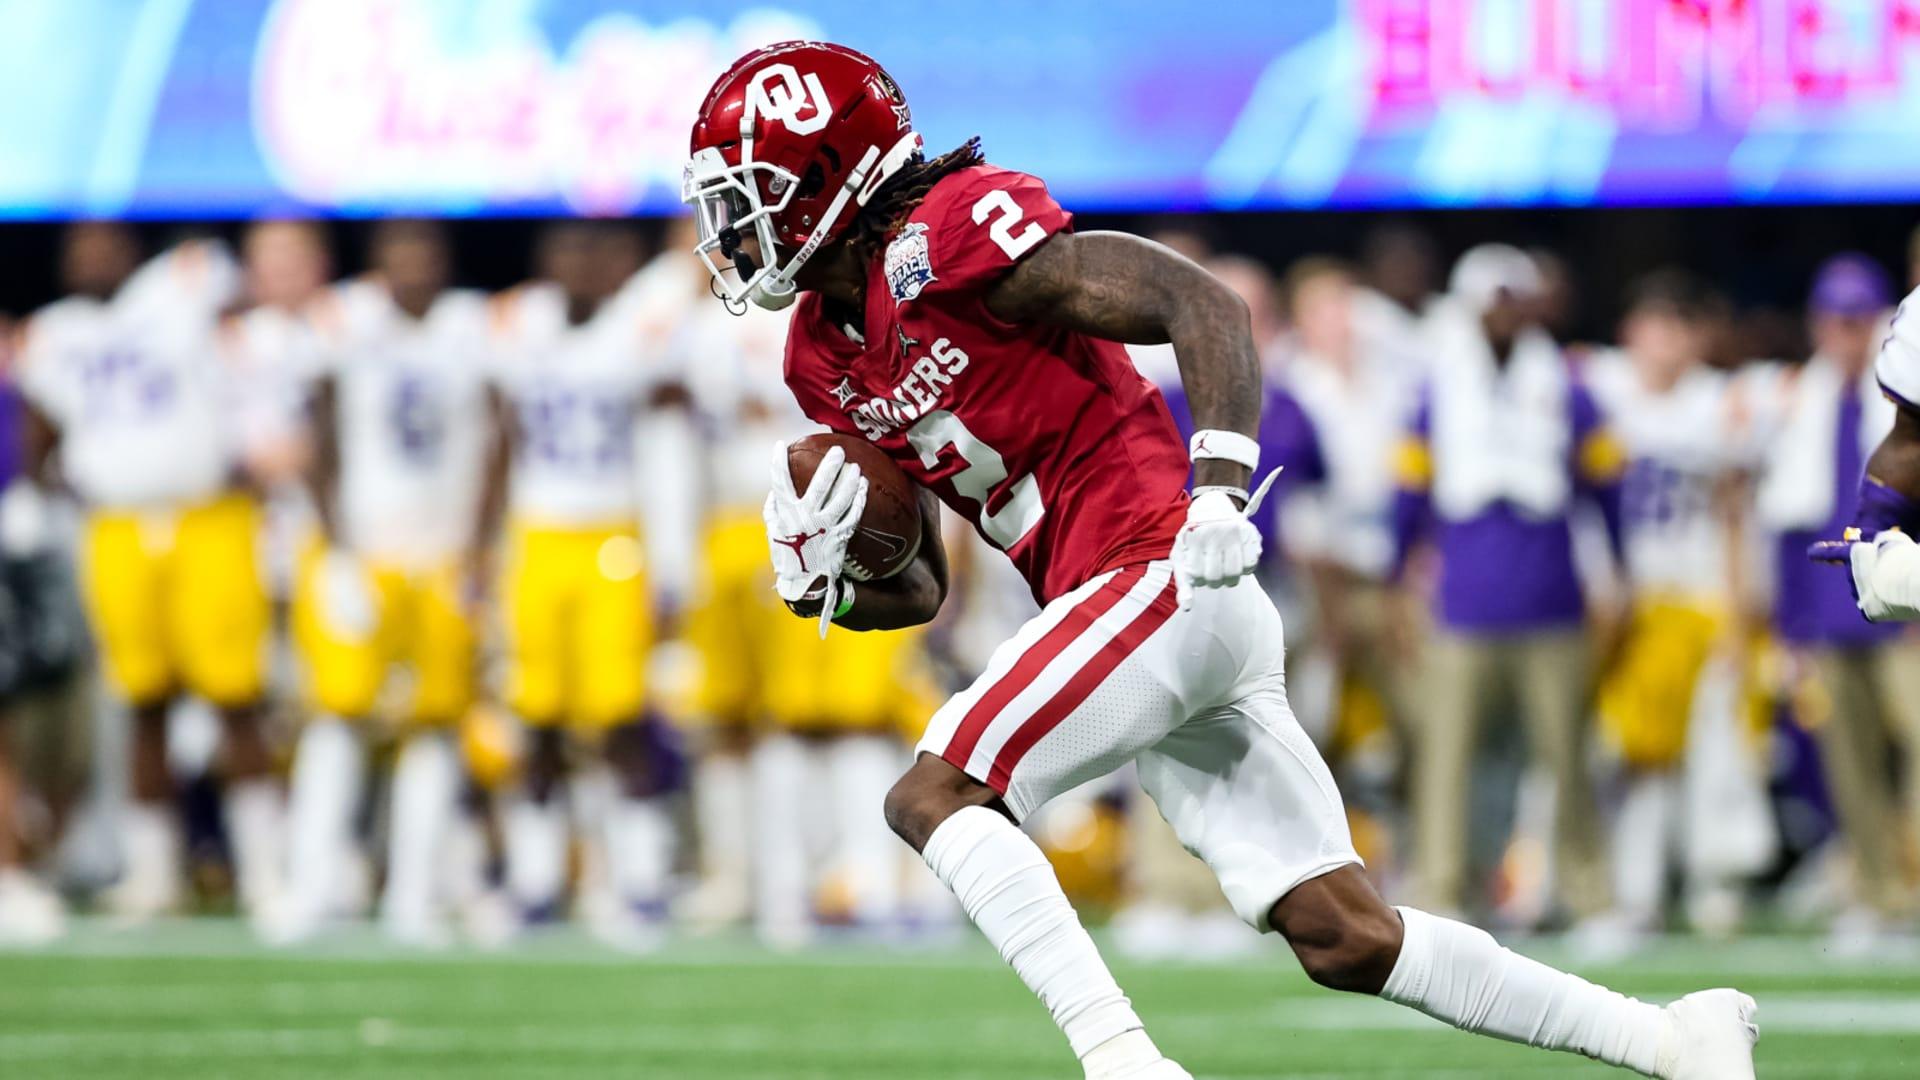 2020 NFL Combine recap: Loaded wide receiver class puts on a show